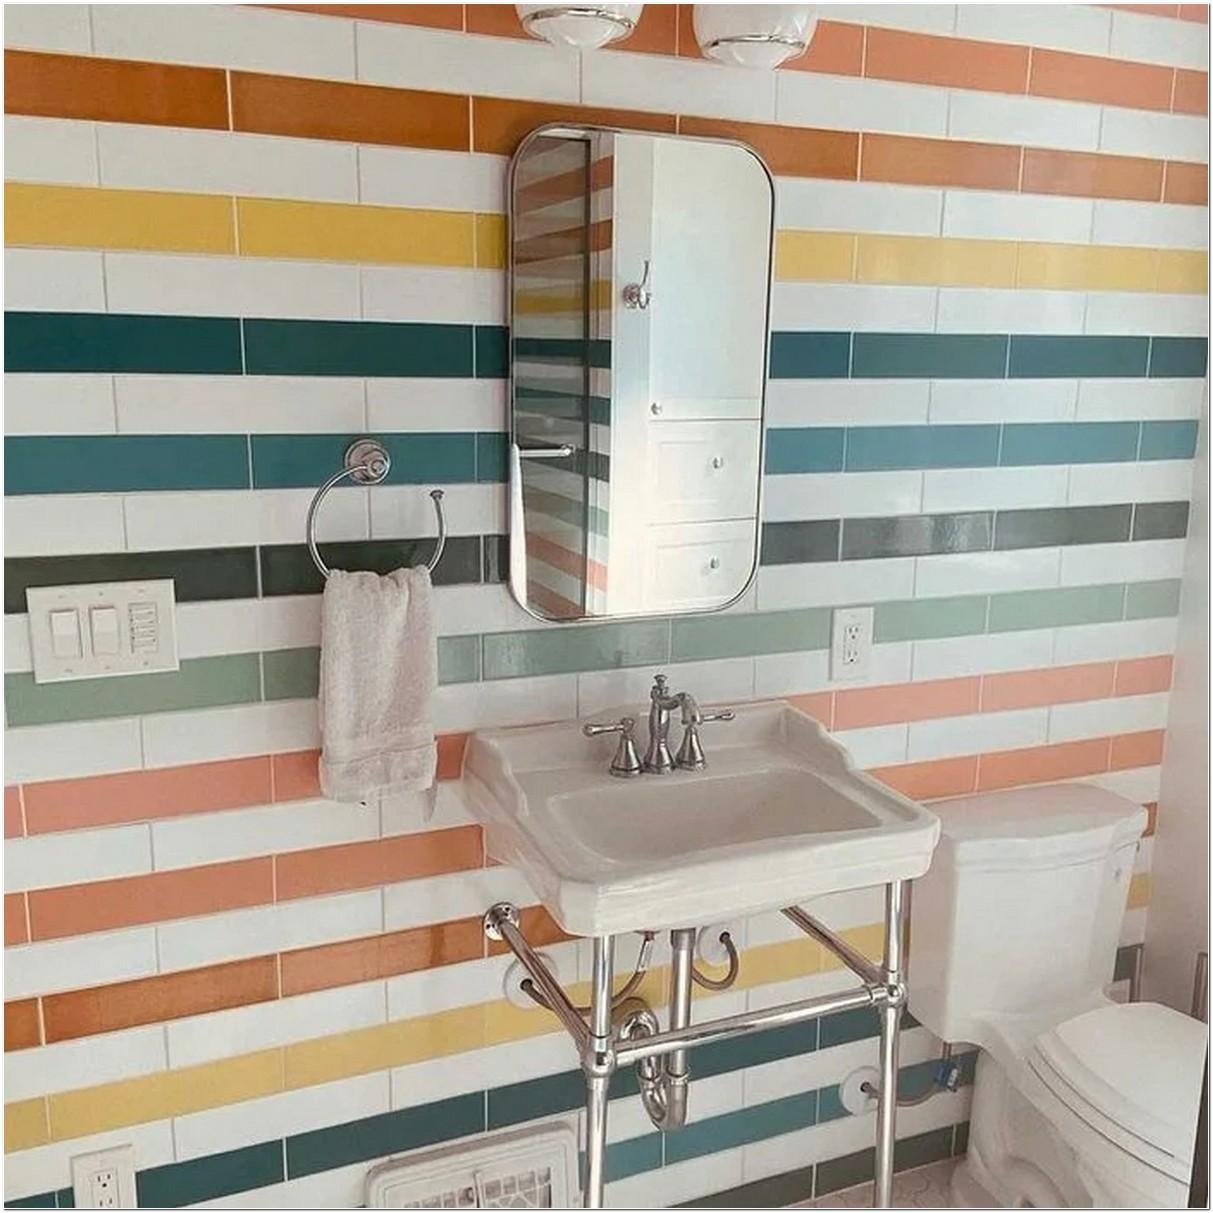 10 Best Kids Bathroom Decor Ideas